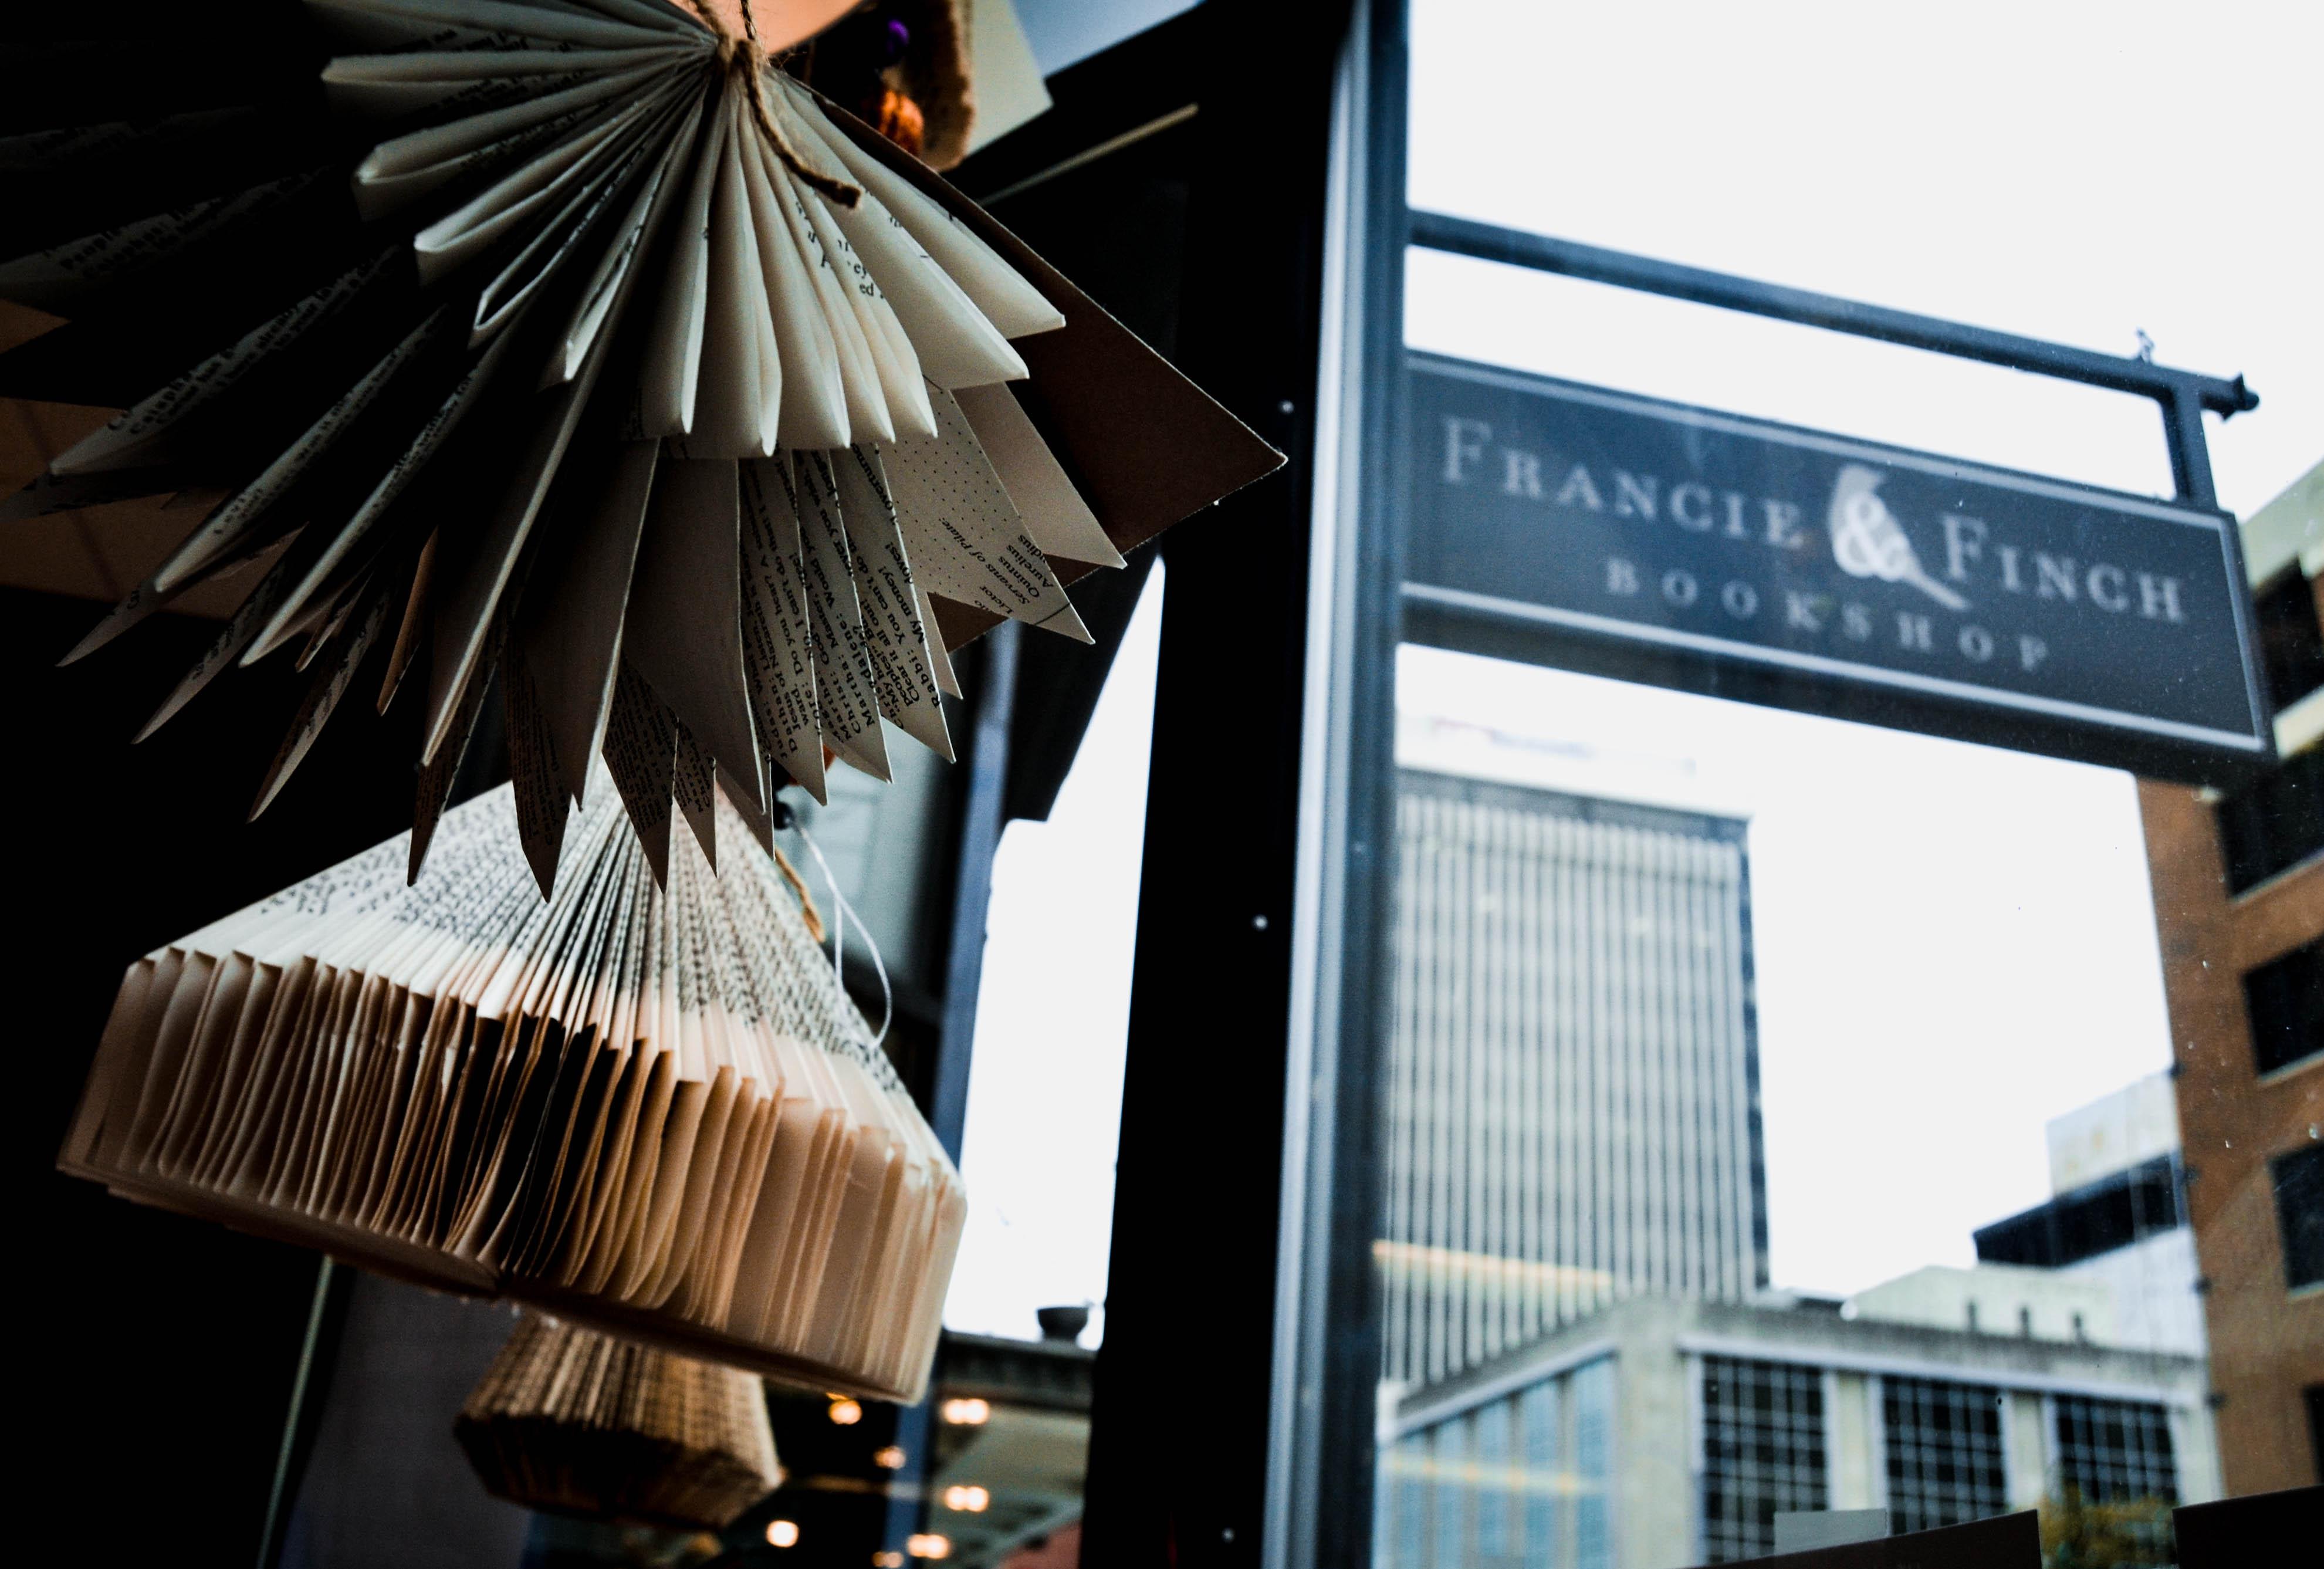 Shop the Blocks 2020 Spotlight: Francie & Finch Bookshop